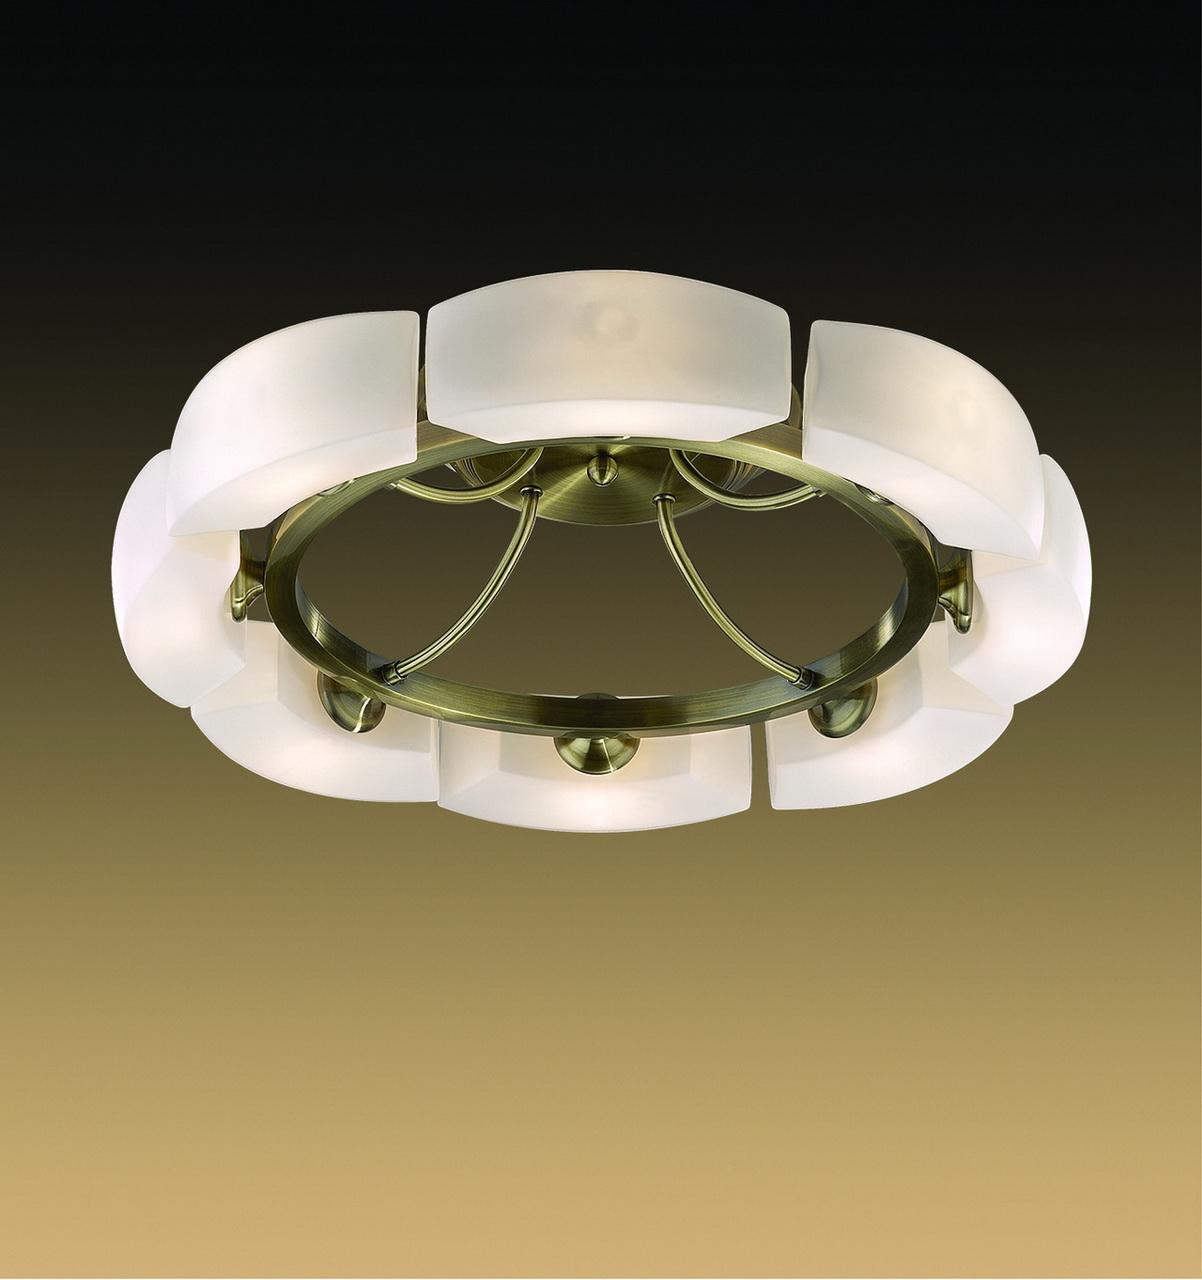 Потолочная люстра Odeon Light Barca 1713/8C потолочная люстра odeon light domeka 2706 8cl